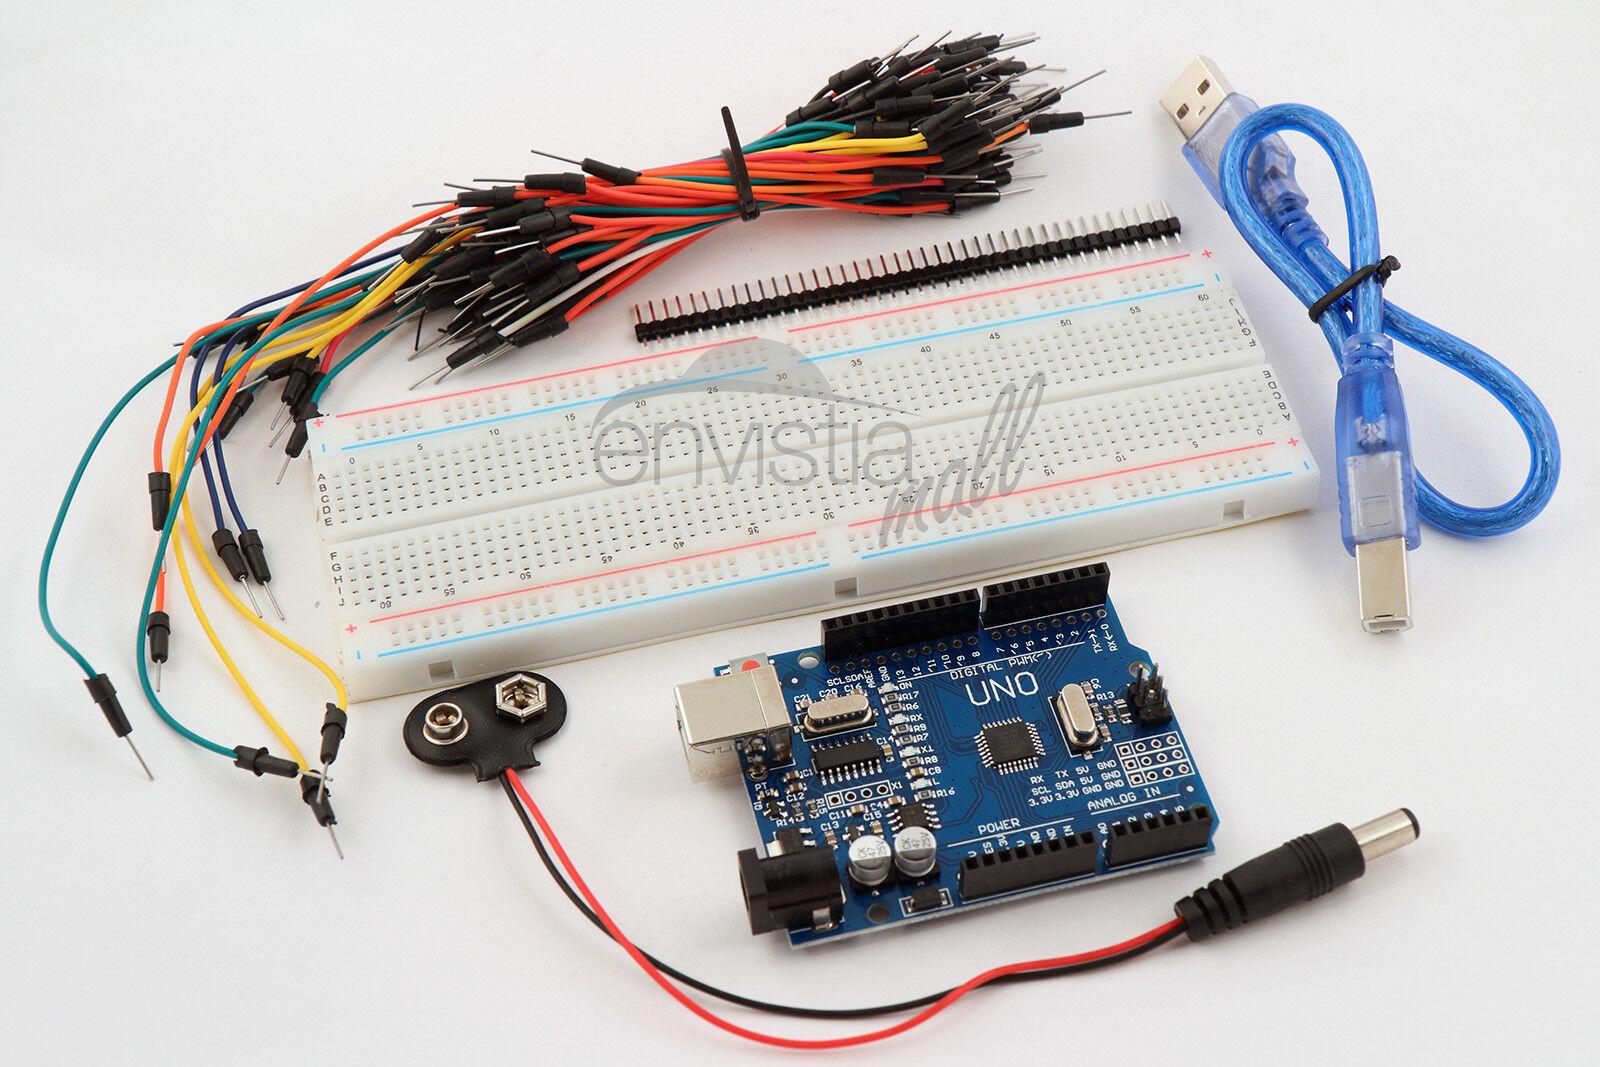 Arduino Uno Starter Kit 830 Point Breadboard, 65 Jumpers, US